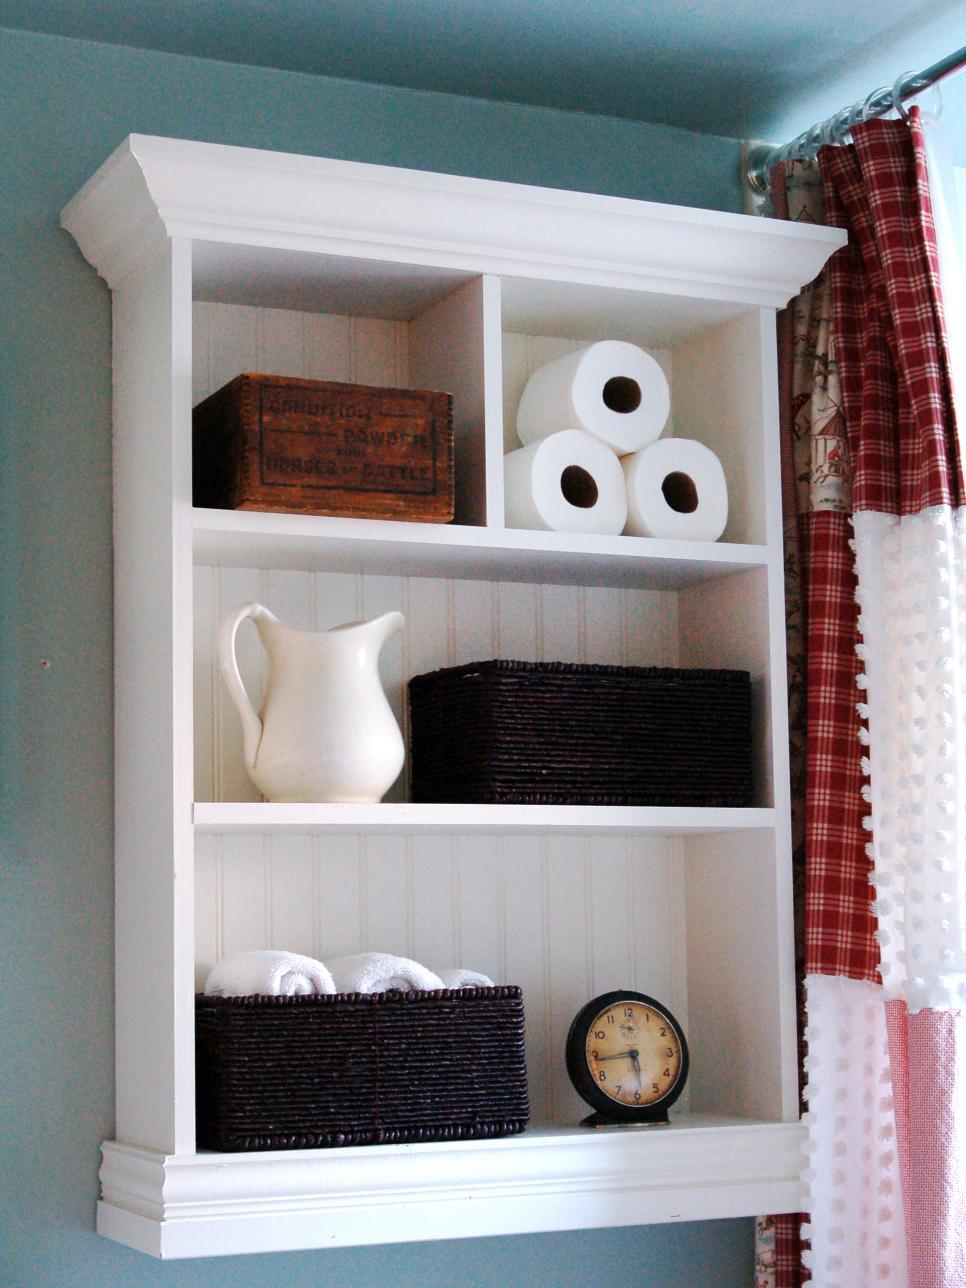 Compact 12 Clever Bathroom Storage Ideas | HGTV bathroom wall storage